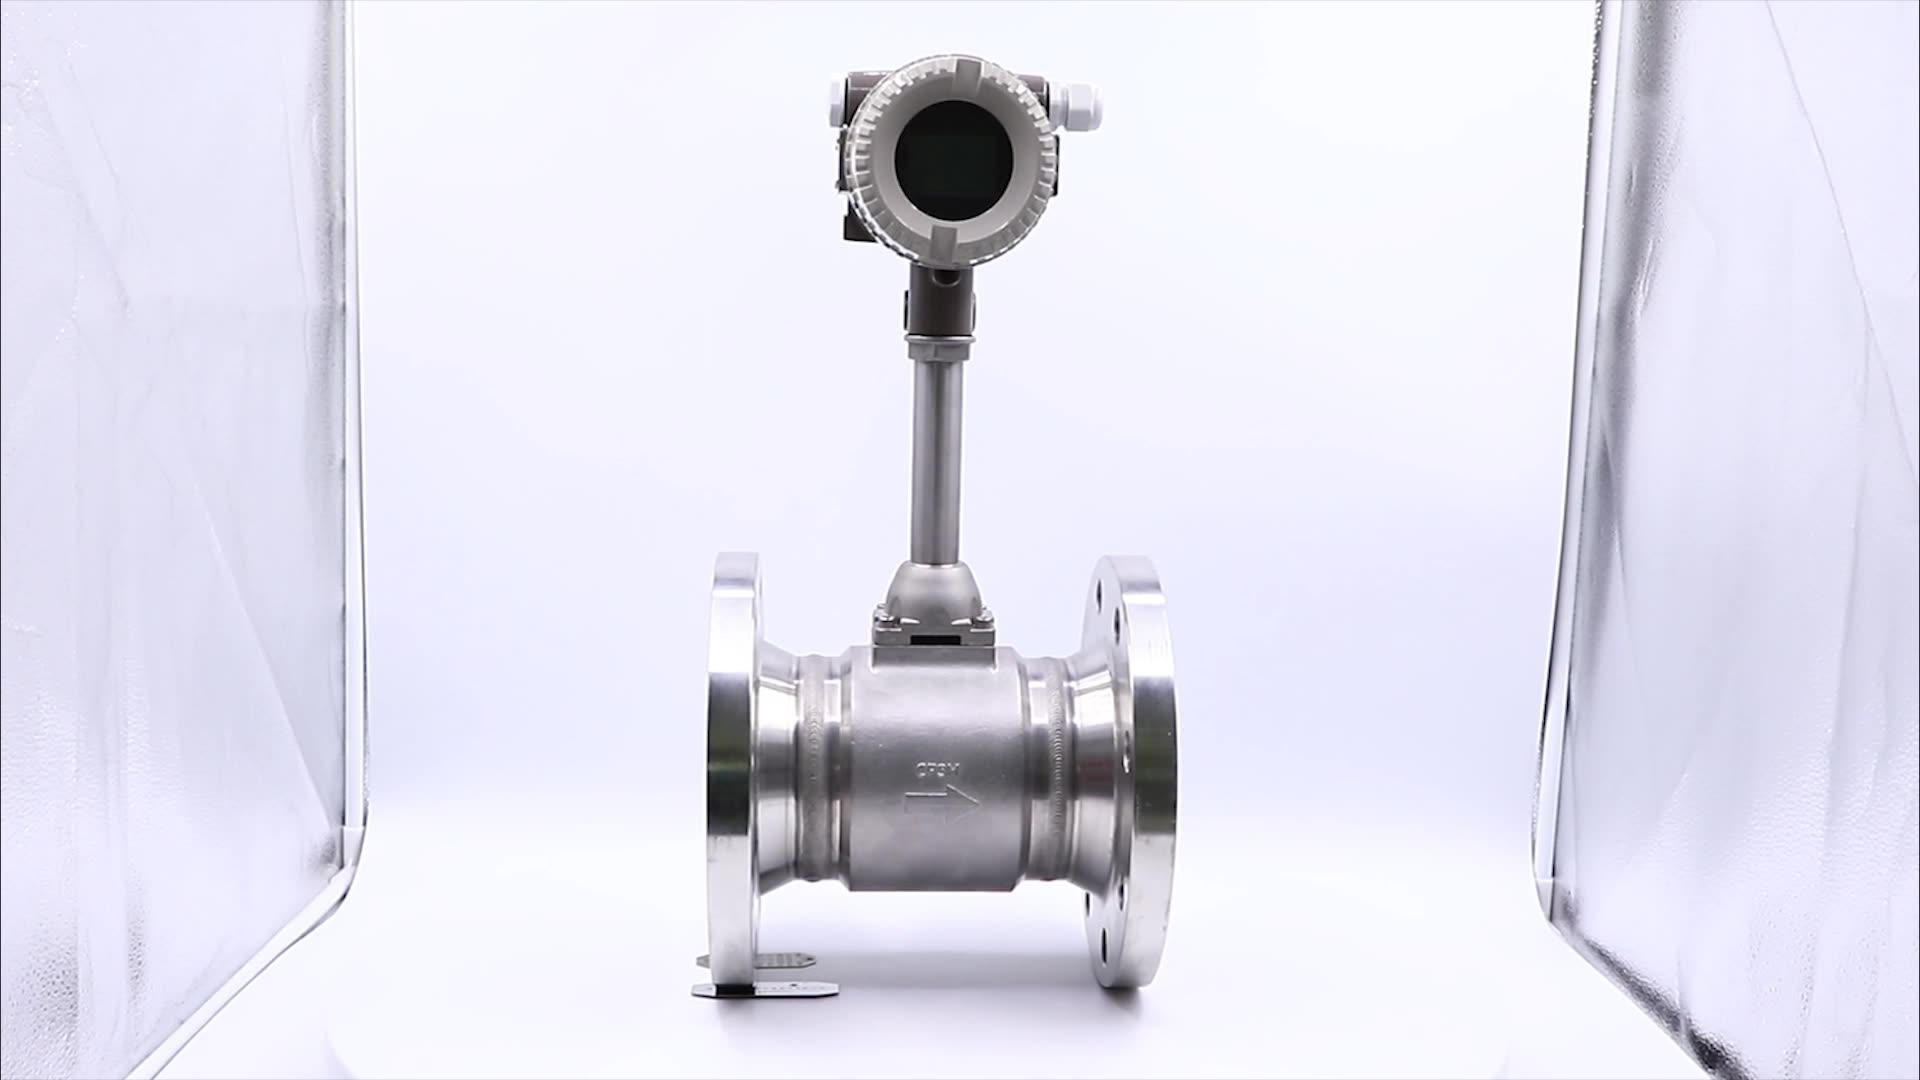 Vortex Flowmeter With Transmitter /Air Flow Sensor/Compressed Air Compressor Manufacture In China